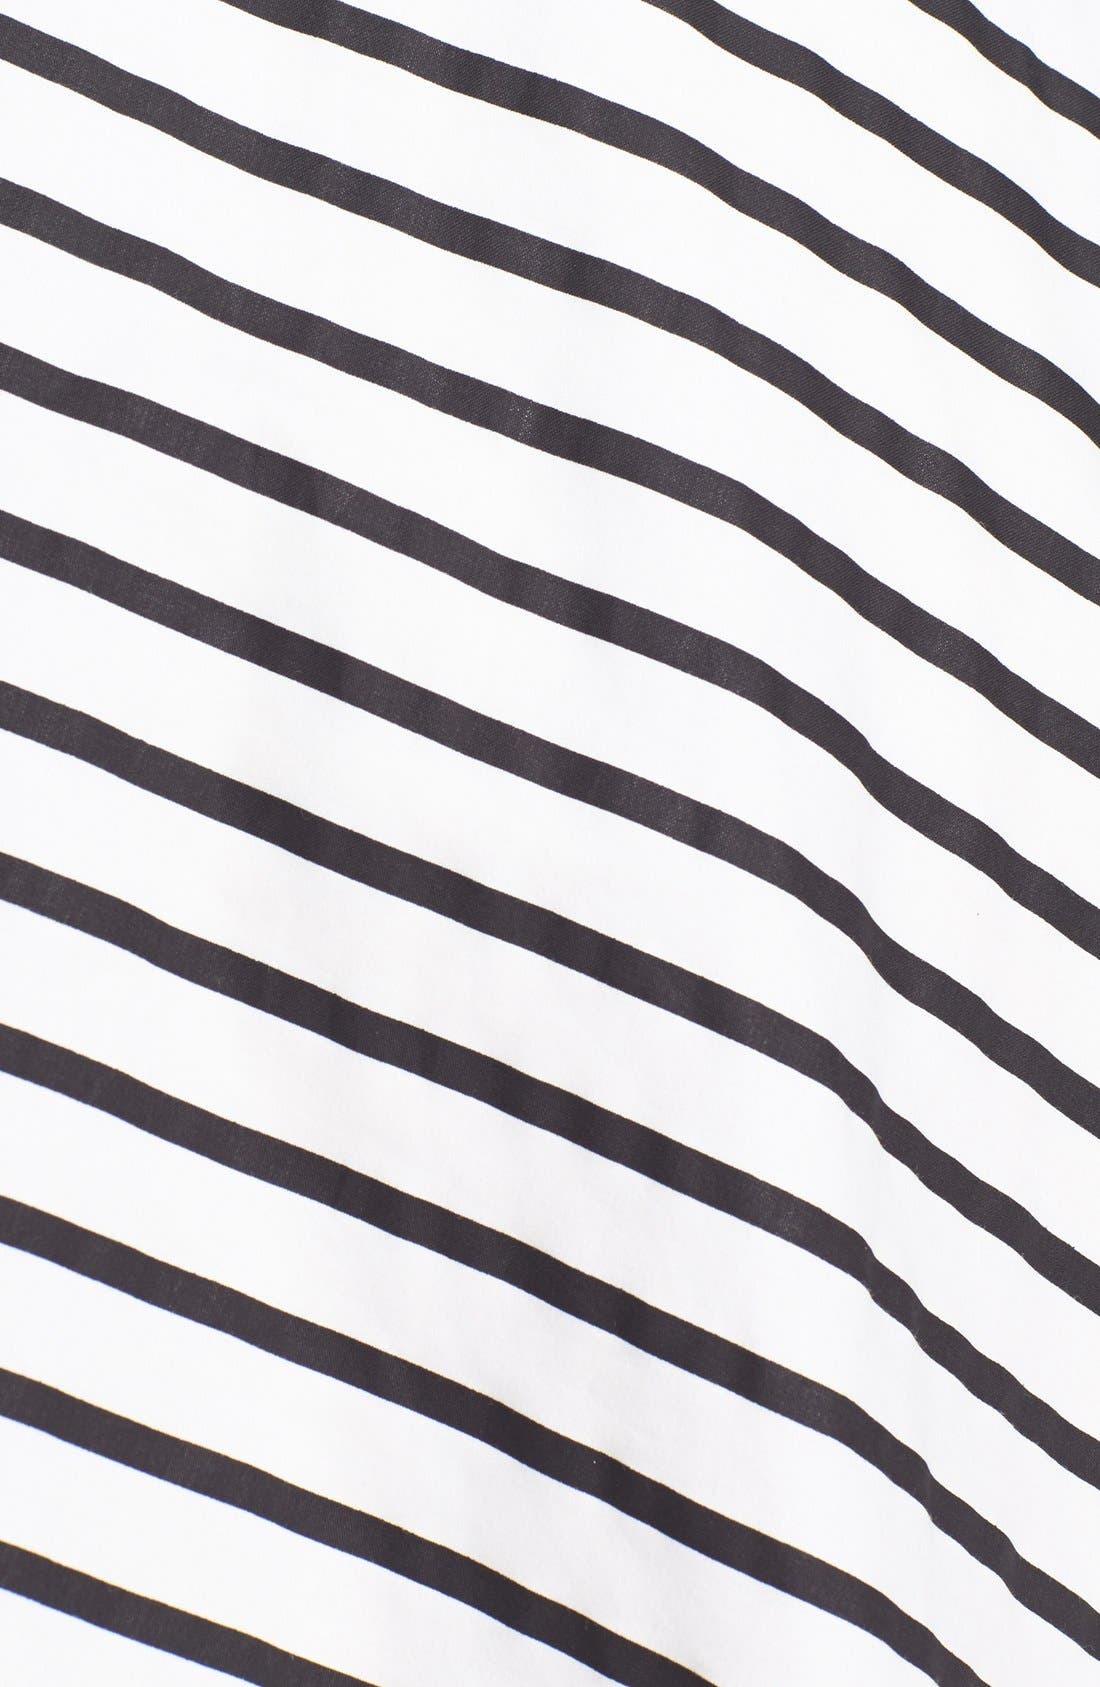 Back Cutout Stripe Cotton Sateen Fit & Flare Dress,                             Alternate thumbnail 4, color,                             Black/ White